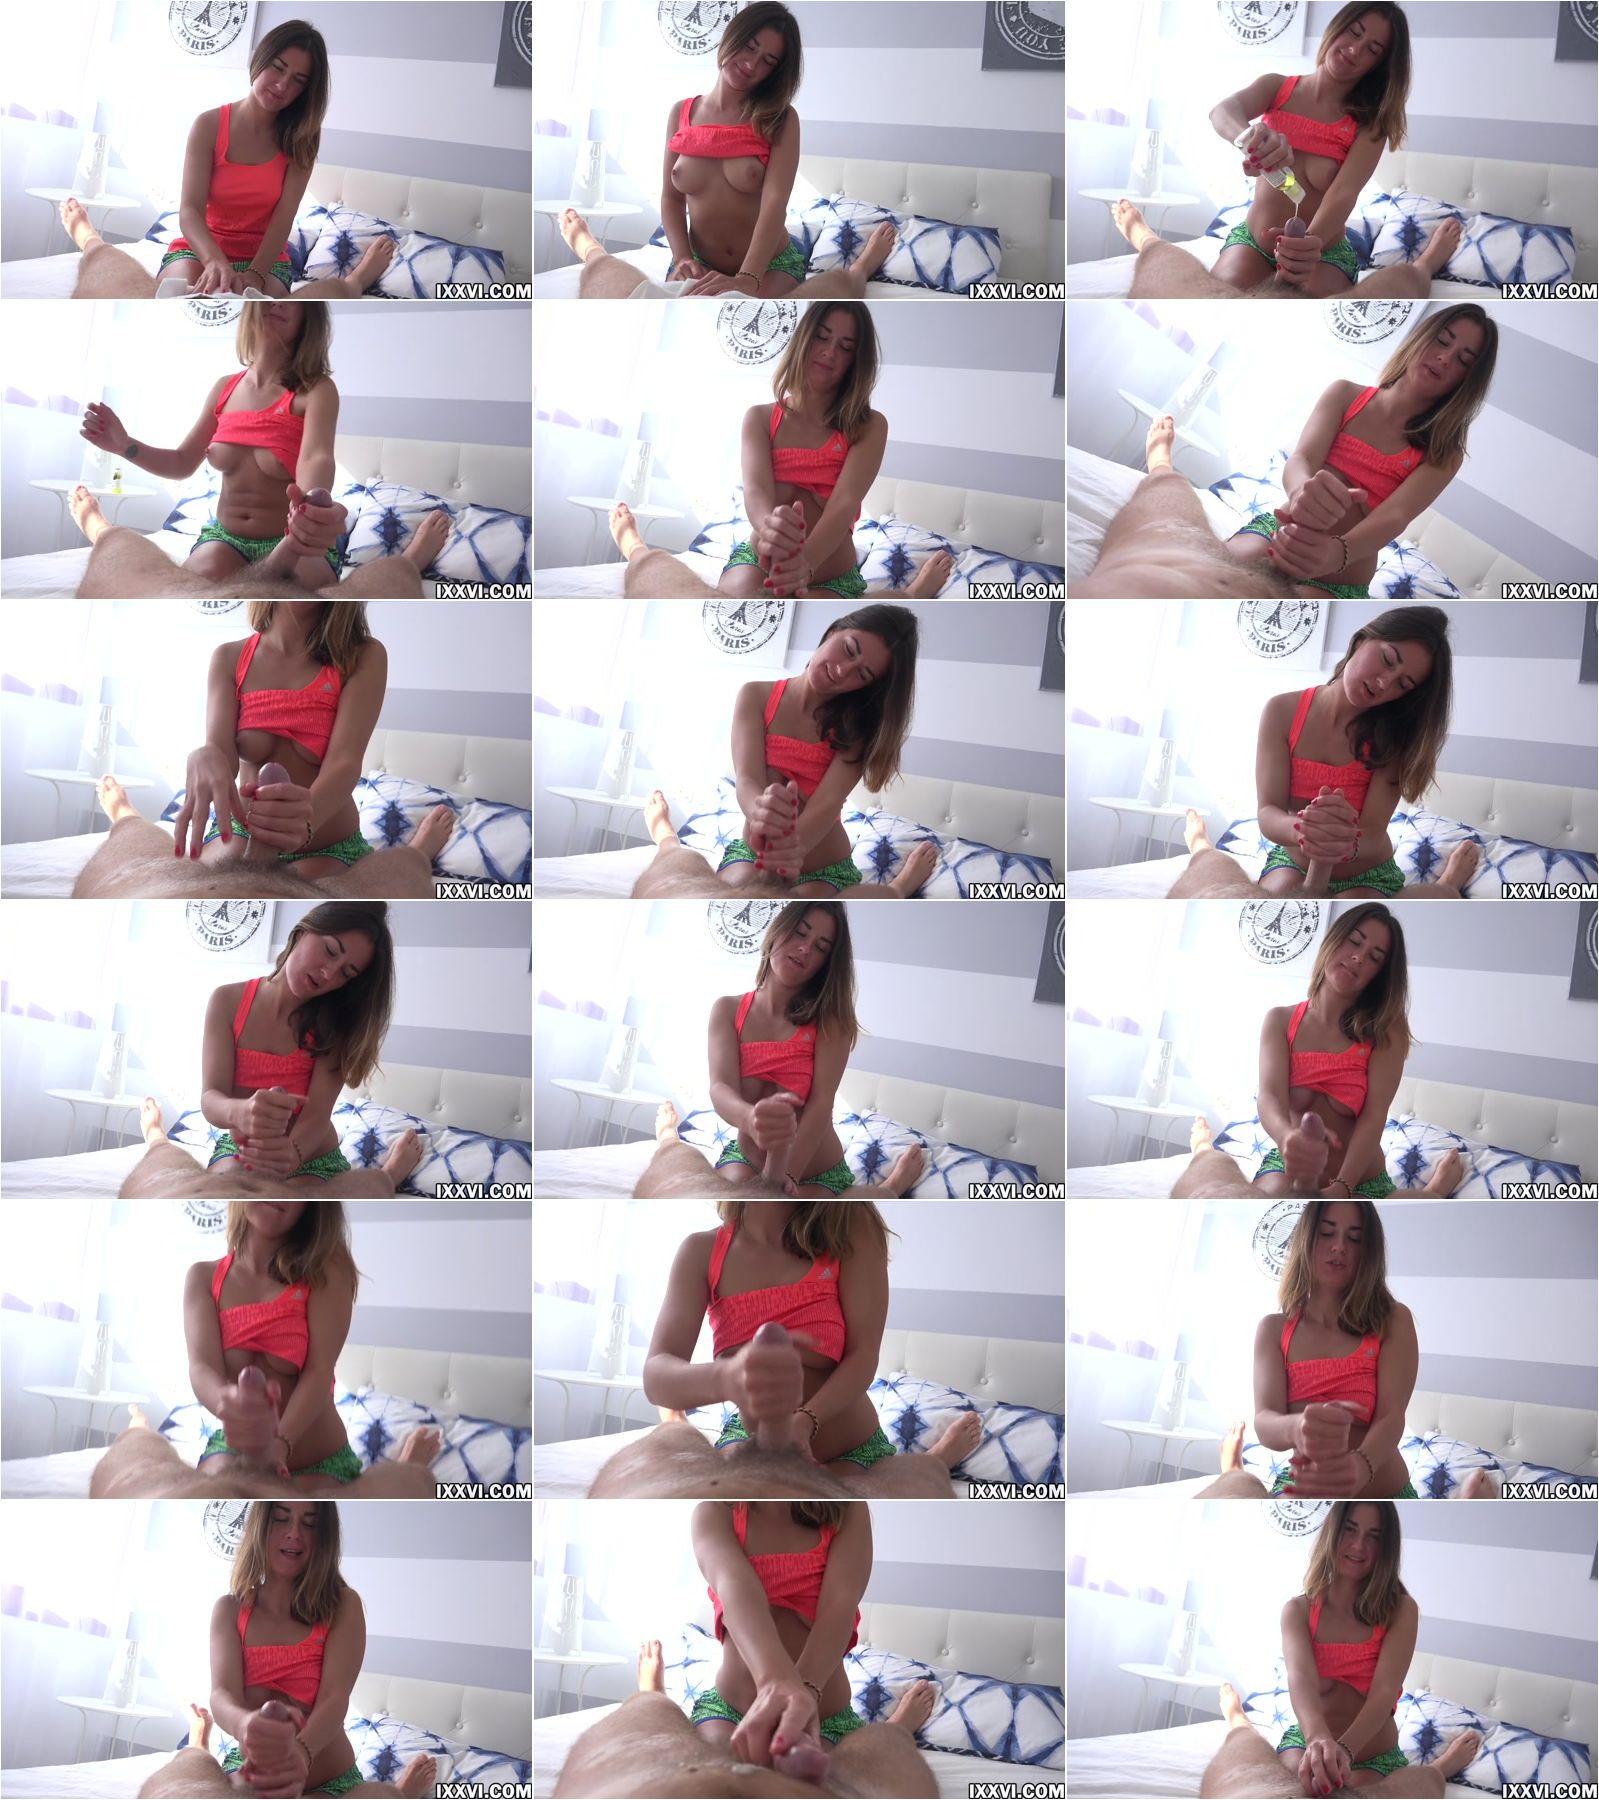 b468c6f25c53 - [PORNHUBPREMIUM.COM] Download_DepositFiles-Amateur - Awesome Girl Teen and best Handjob (2018/PornHubPremium.com/FullHD) AMATEUR (104.00 MB)